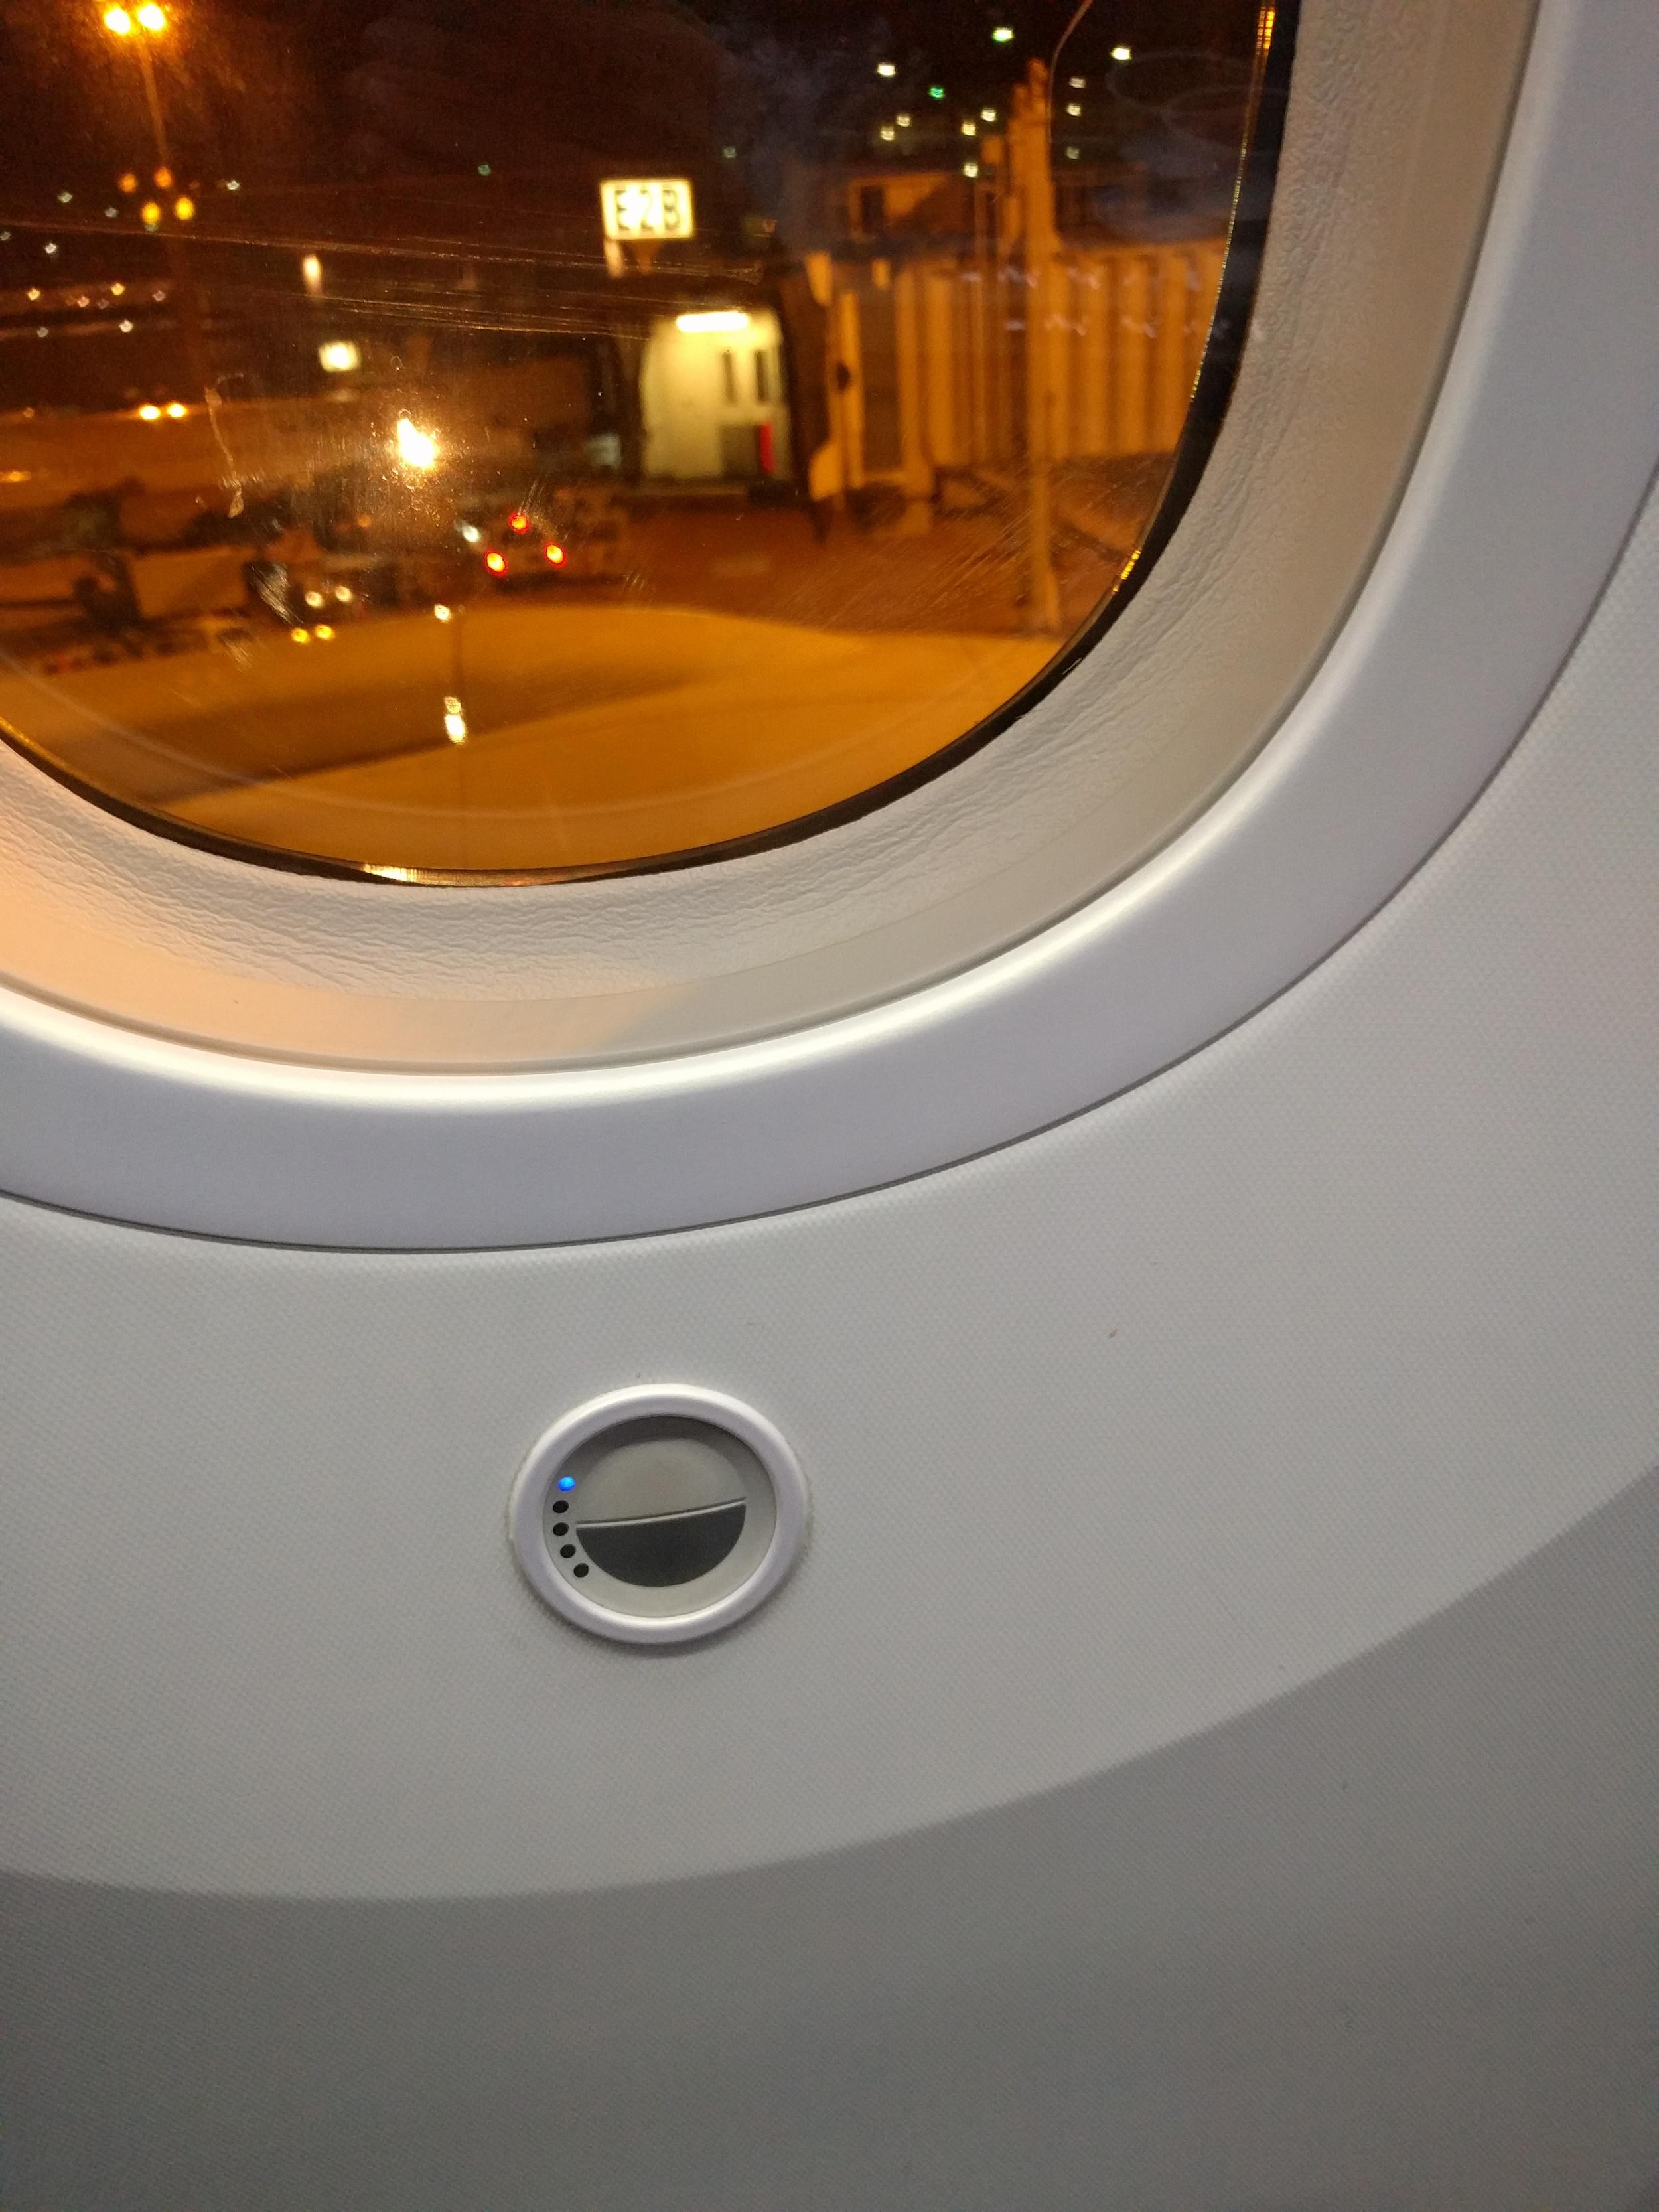 787 Window Shade Controls